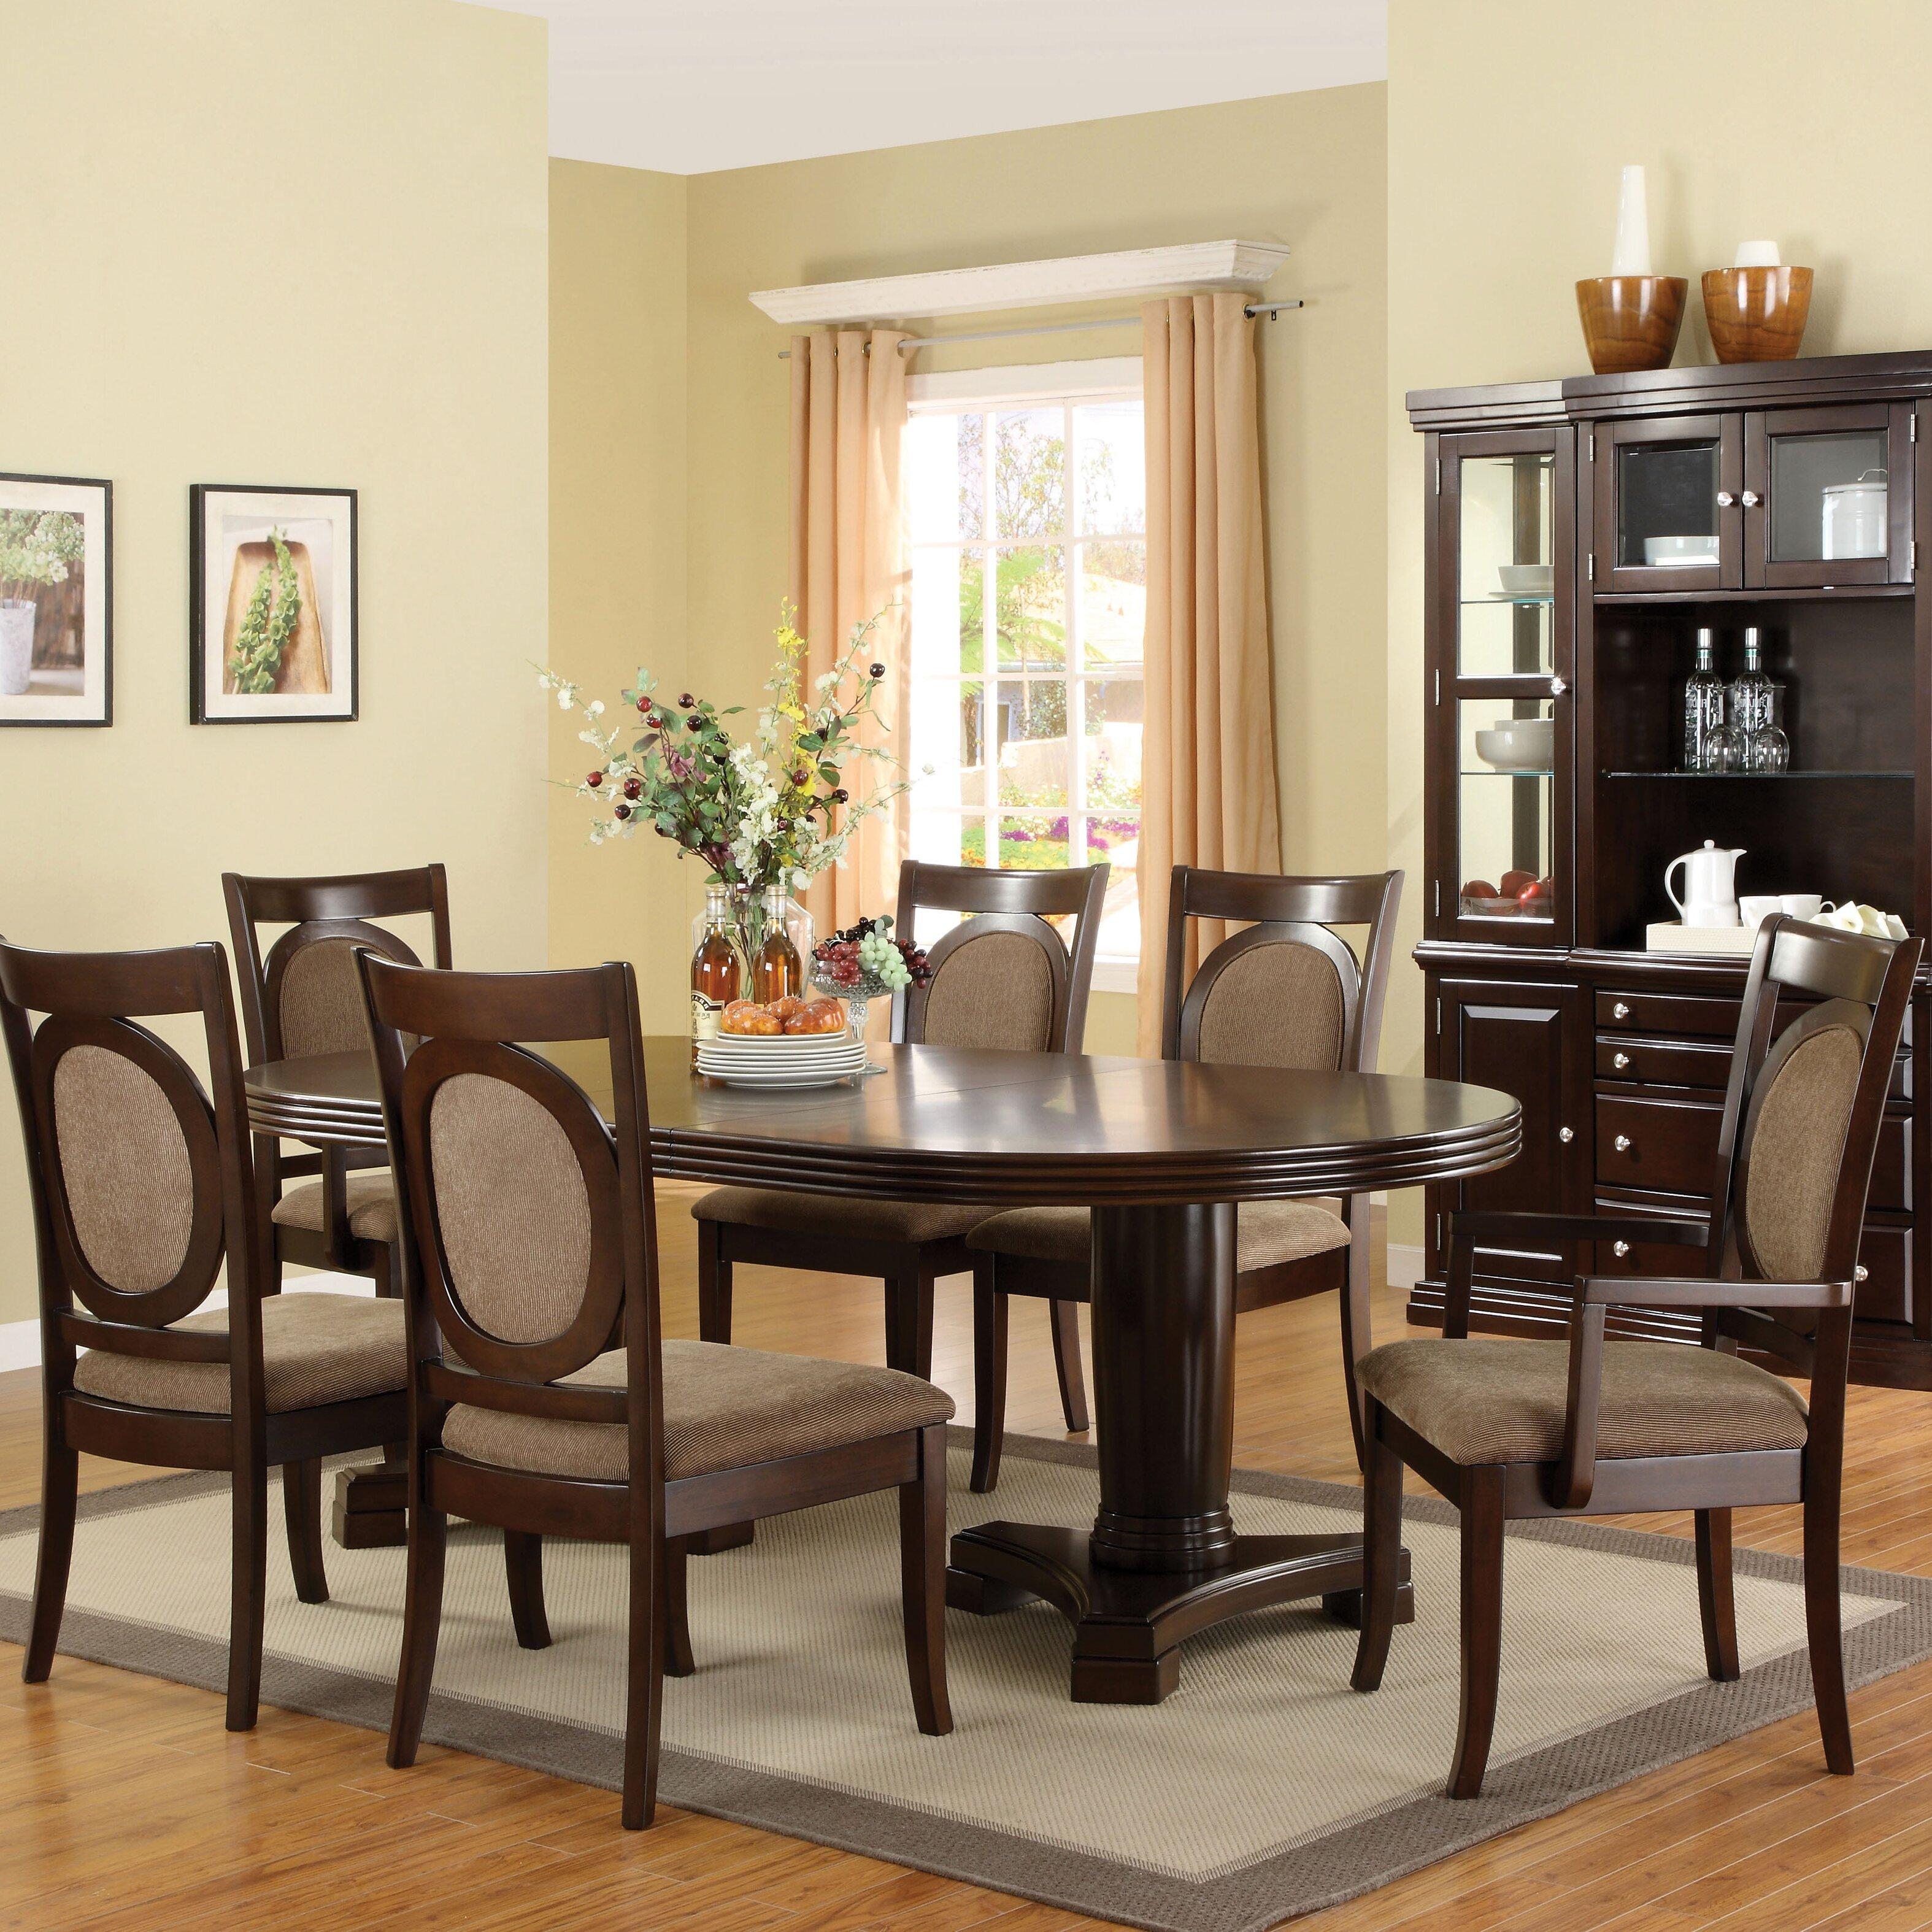 Hokku designs regan 7 piece dining set reviews wayfair for Hokku designs dining room furniture